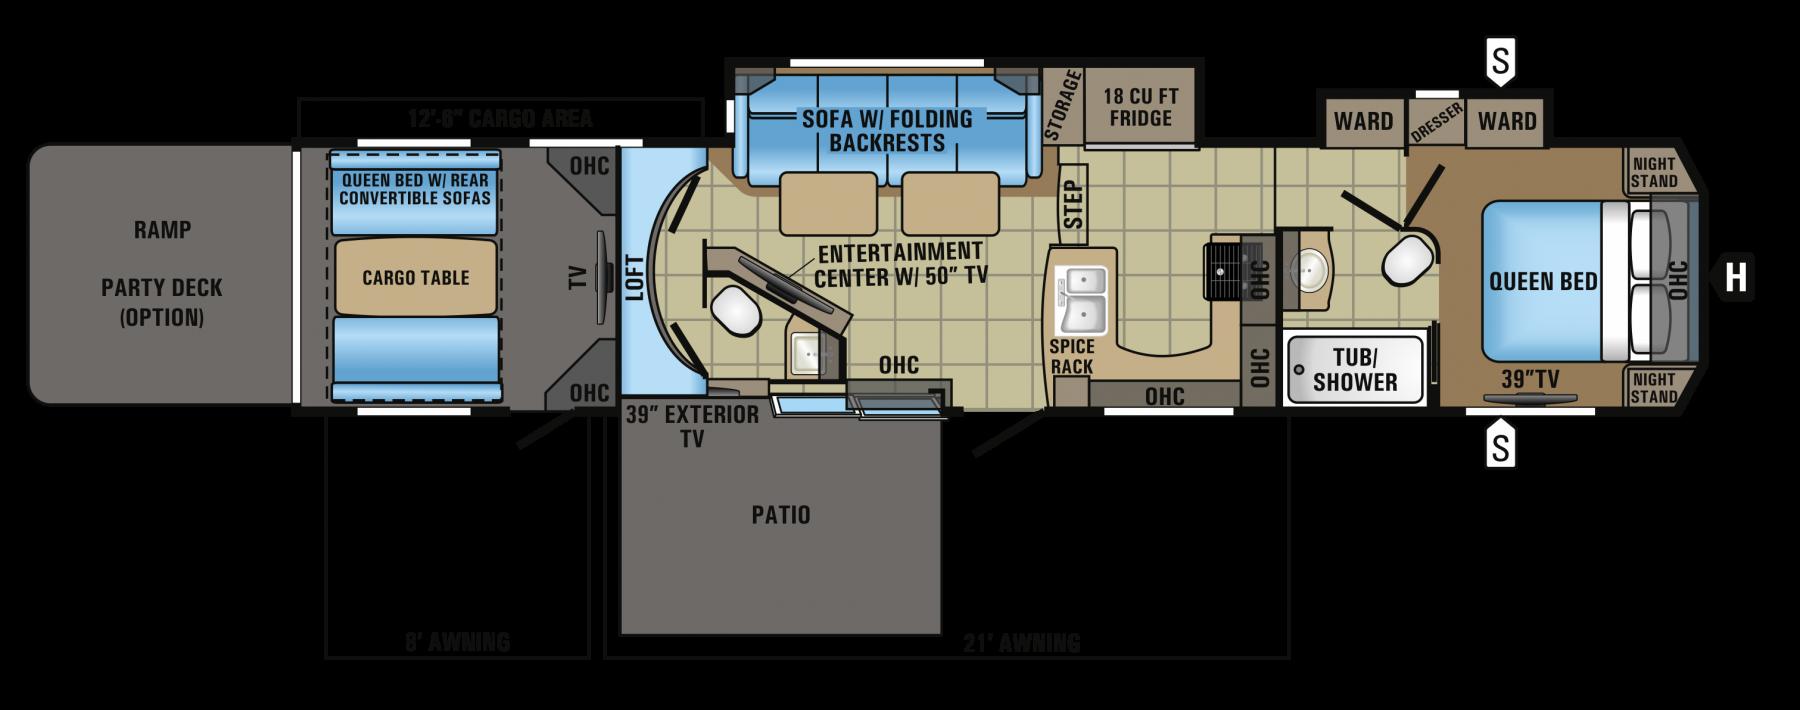 2017 Seismic 4113 Floorplan Toy hauler, Deck party, Jayco